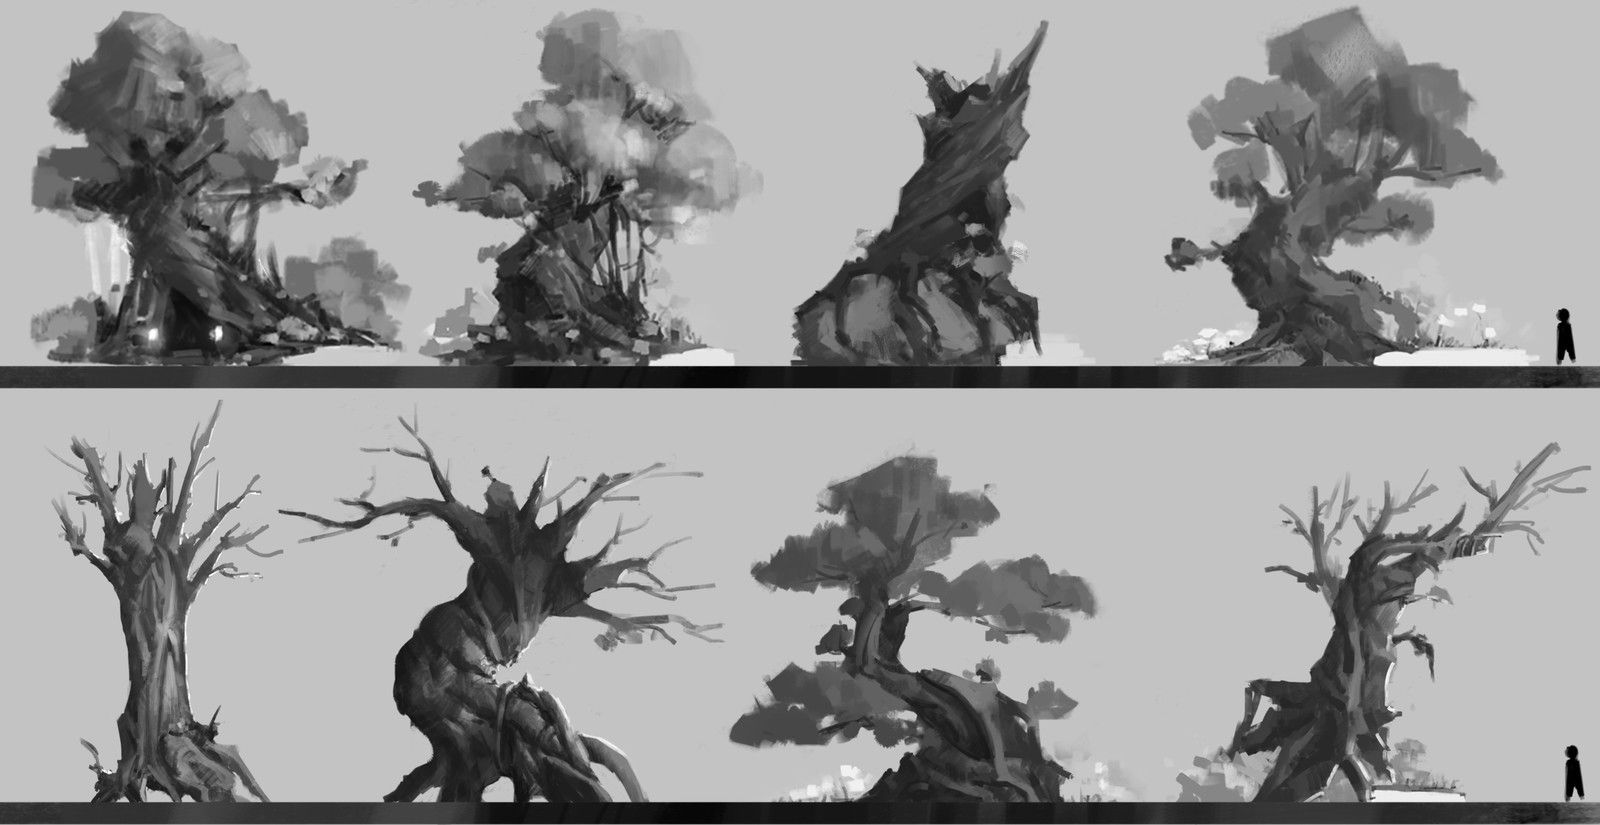 Exercise 1, WoNiu Wang on ArtStation at https://www.artstation.com/artwork/AyQkV